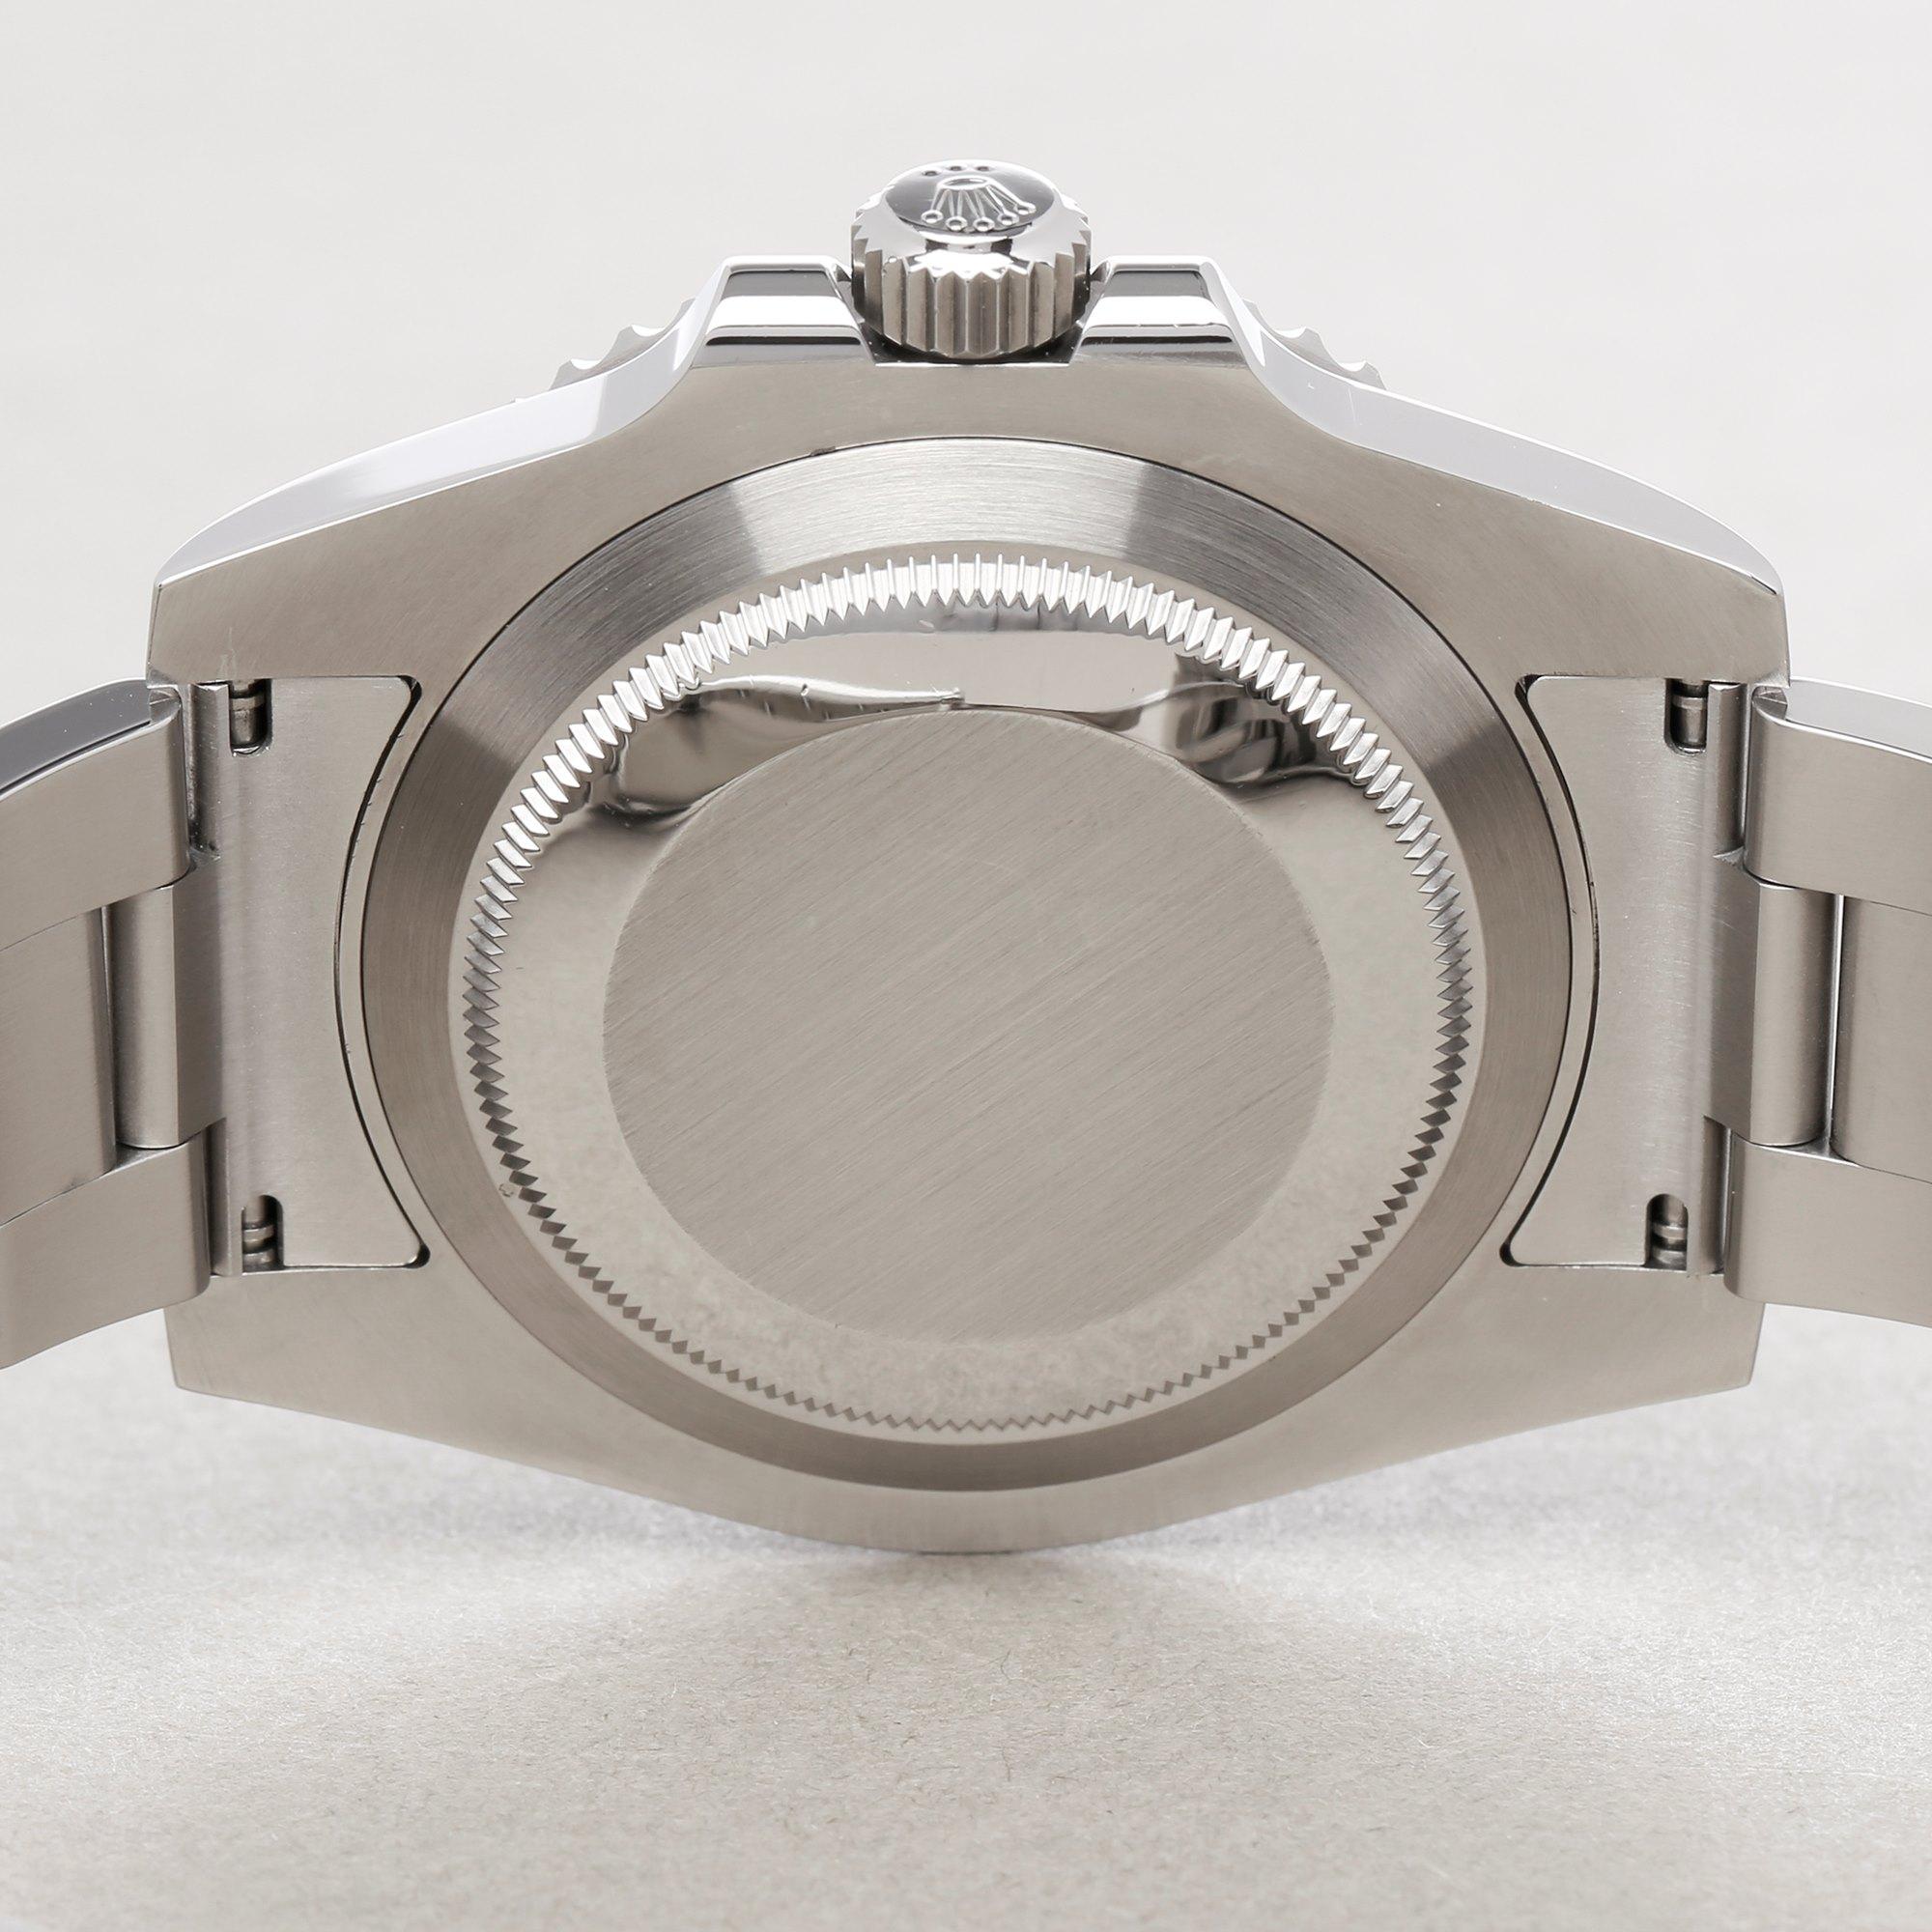 Rolex Submariner Date Hulk Stainless Steel 116610LV